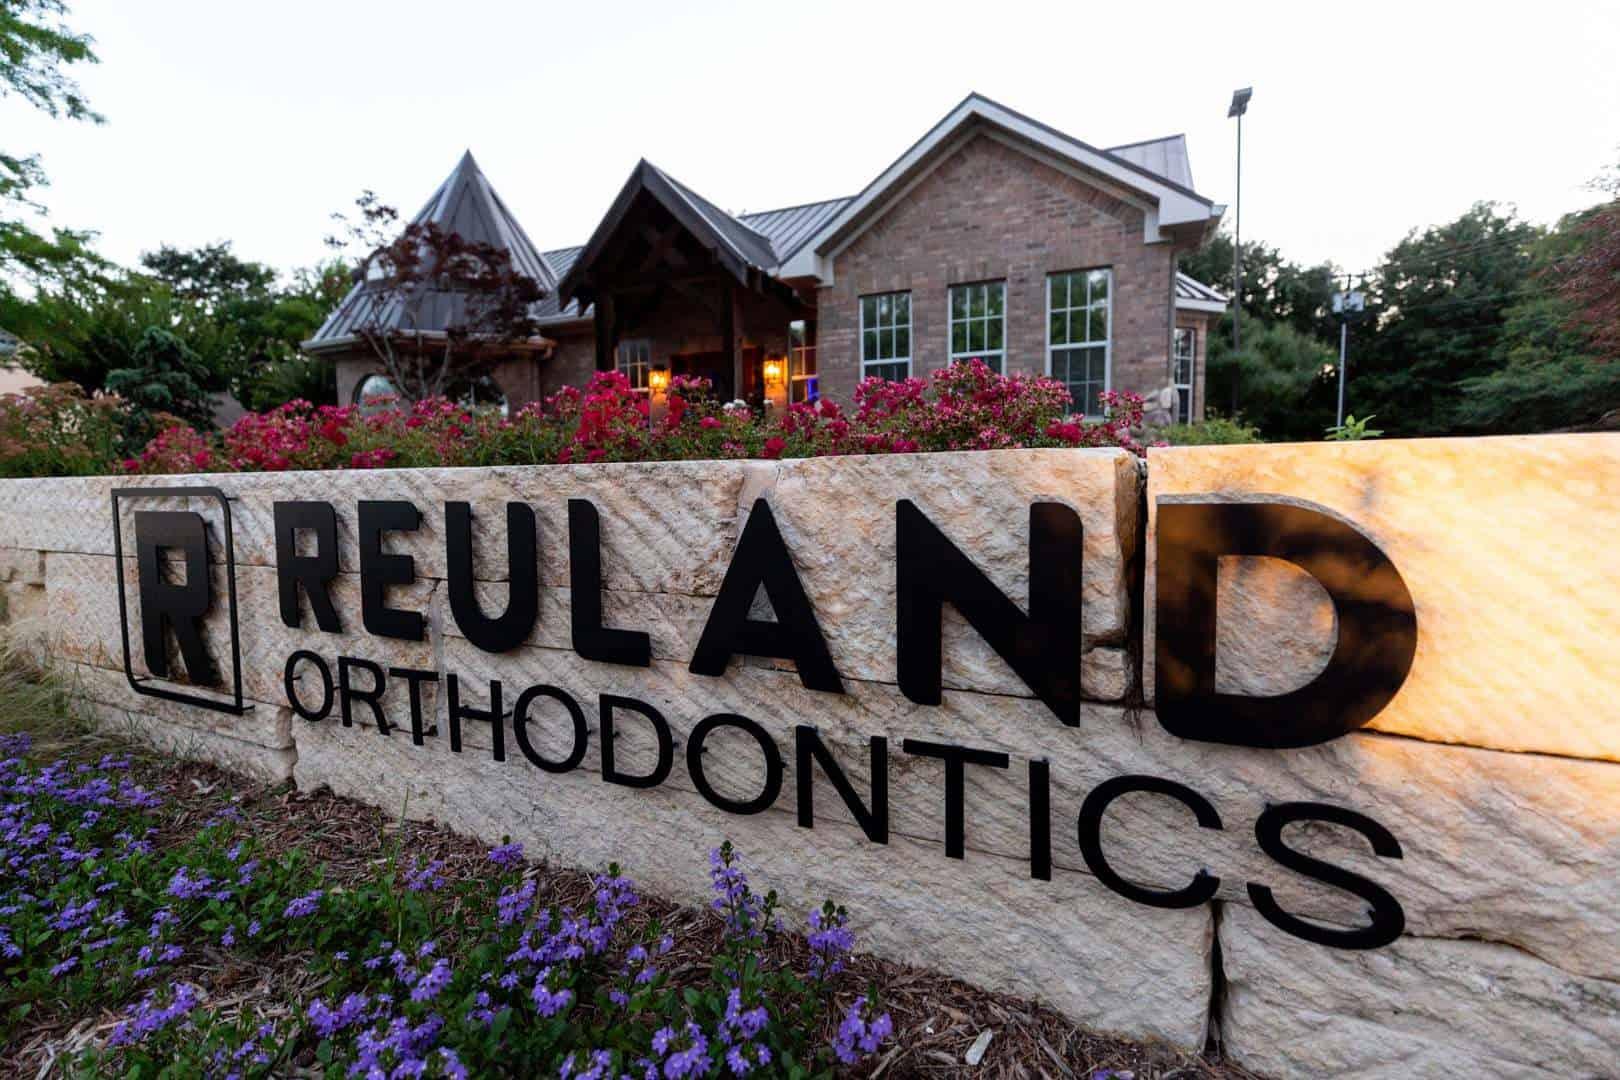 Random Reuland Orthodontics 2018 66 - We're celebrating a HUGE Milestone!